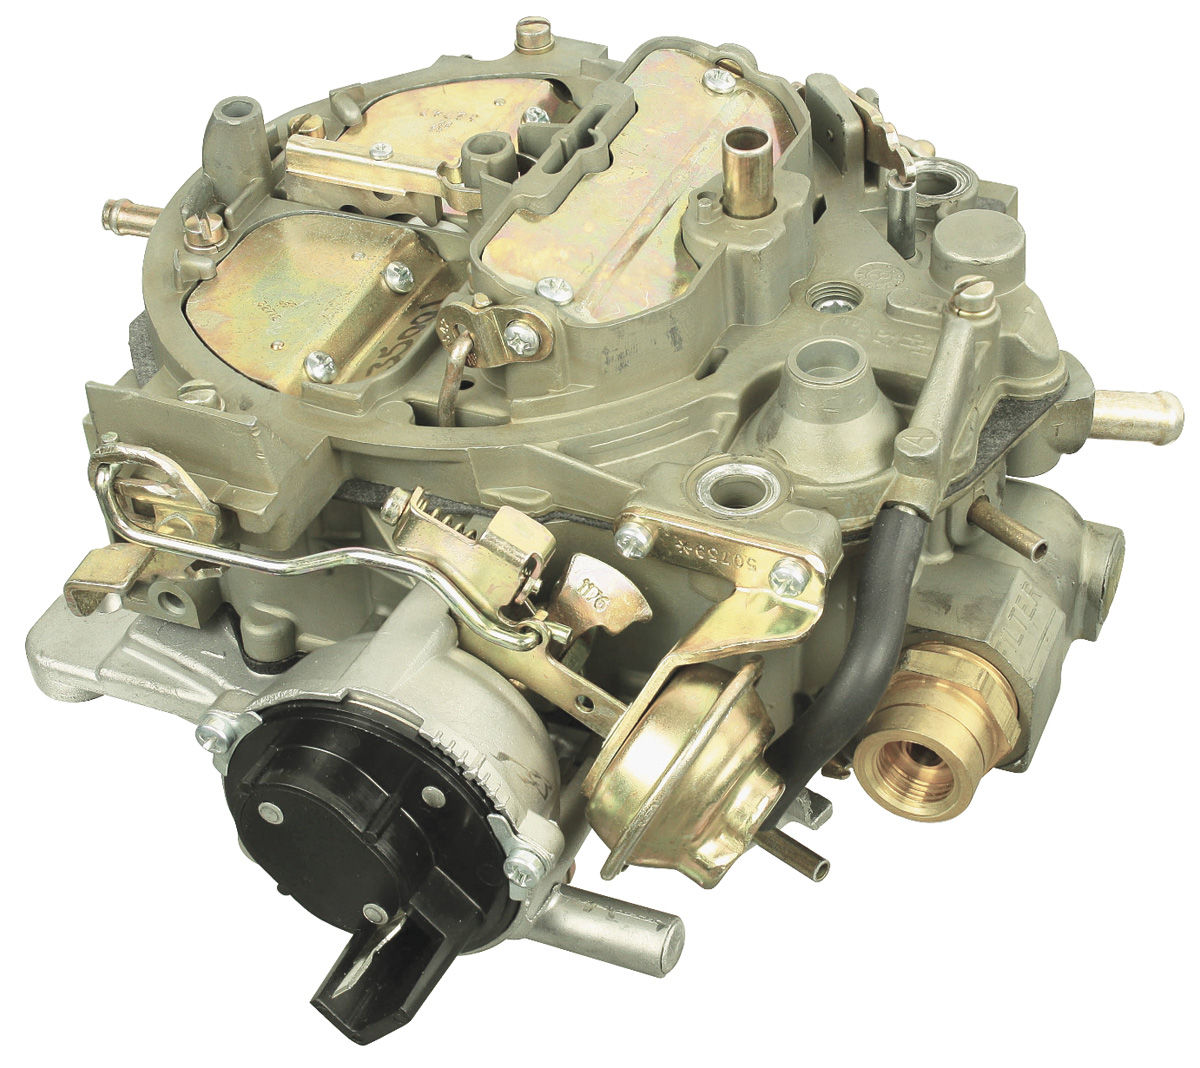 Carburetor, Quadrajet, SMI, 1964-80 Small Block Chevy, Stage 1, 750 cfm